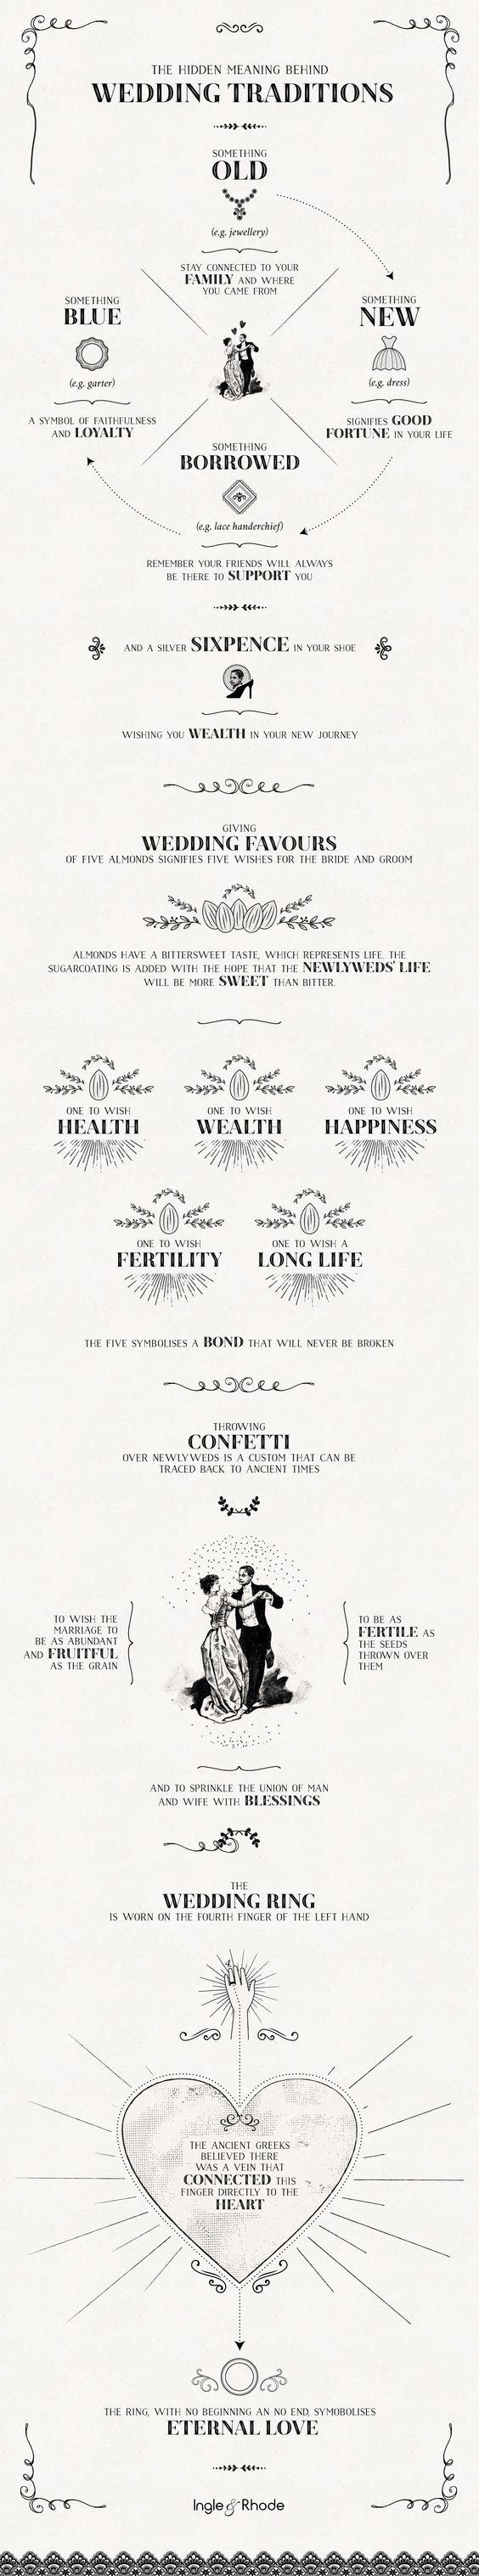 wedding_traditions (2)-min.jpg